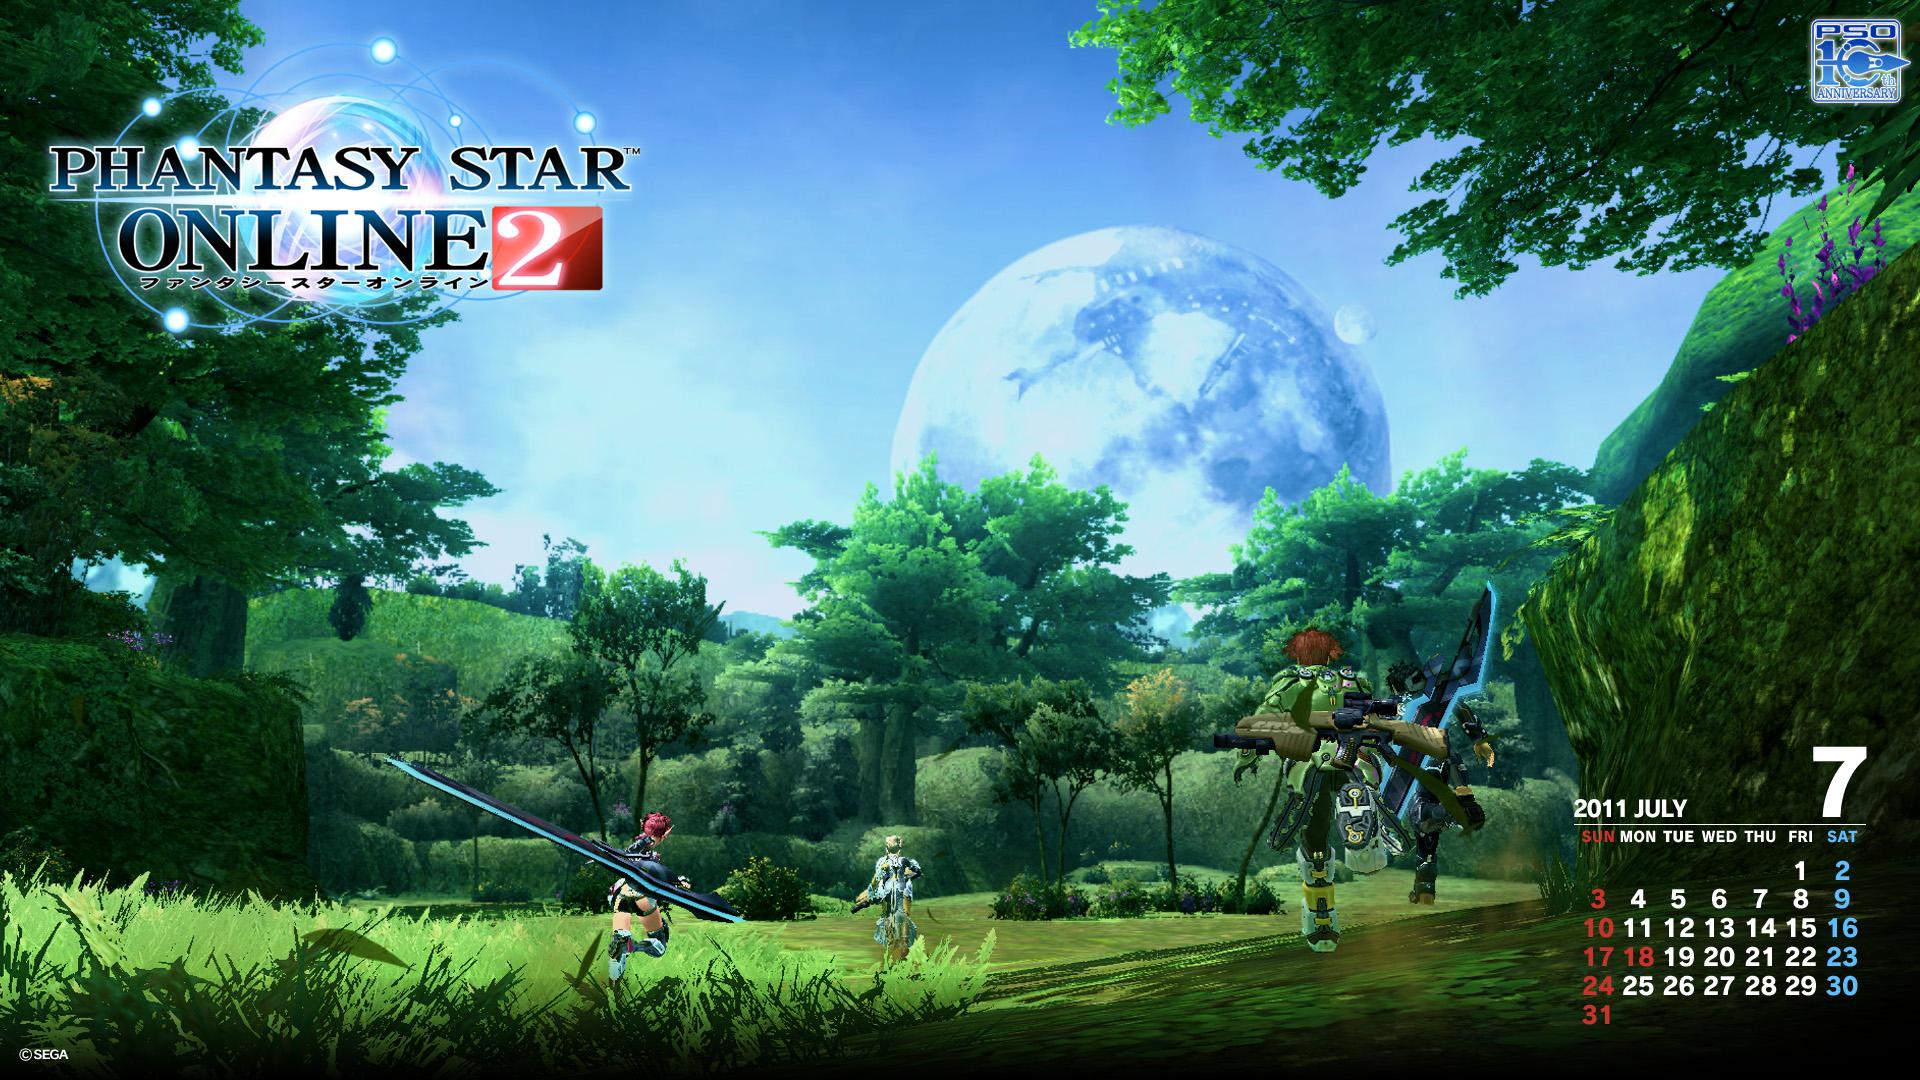 Phantasy Star Online 2 Wallpaper: PSO2 Screens And Gameplay Video